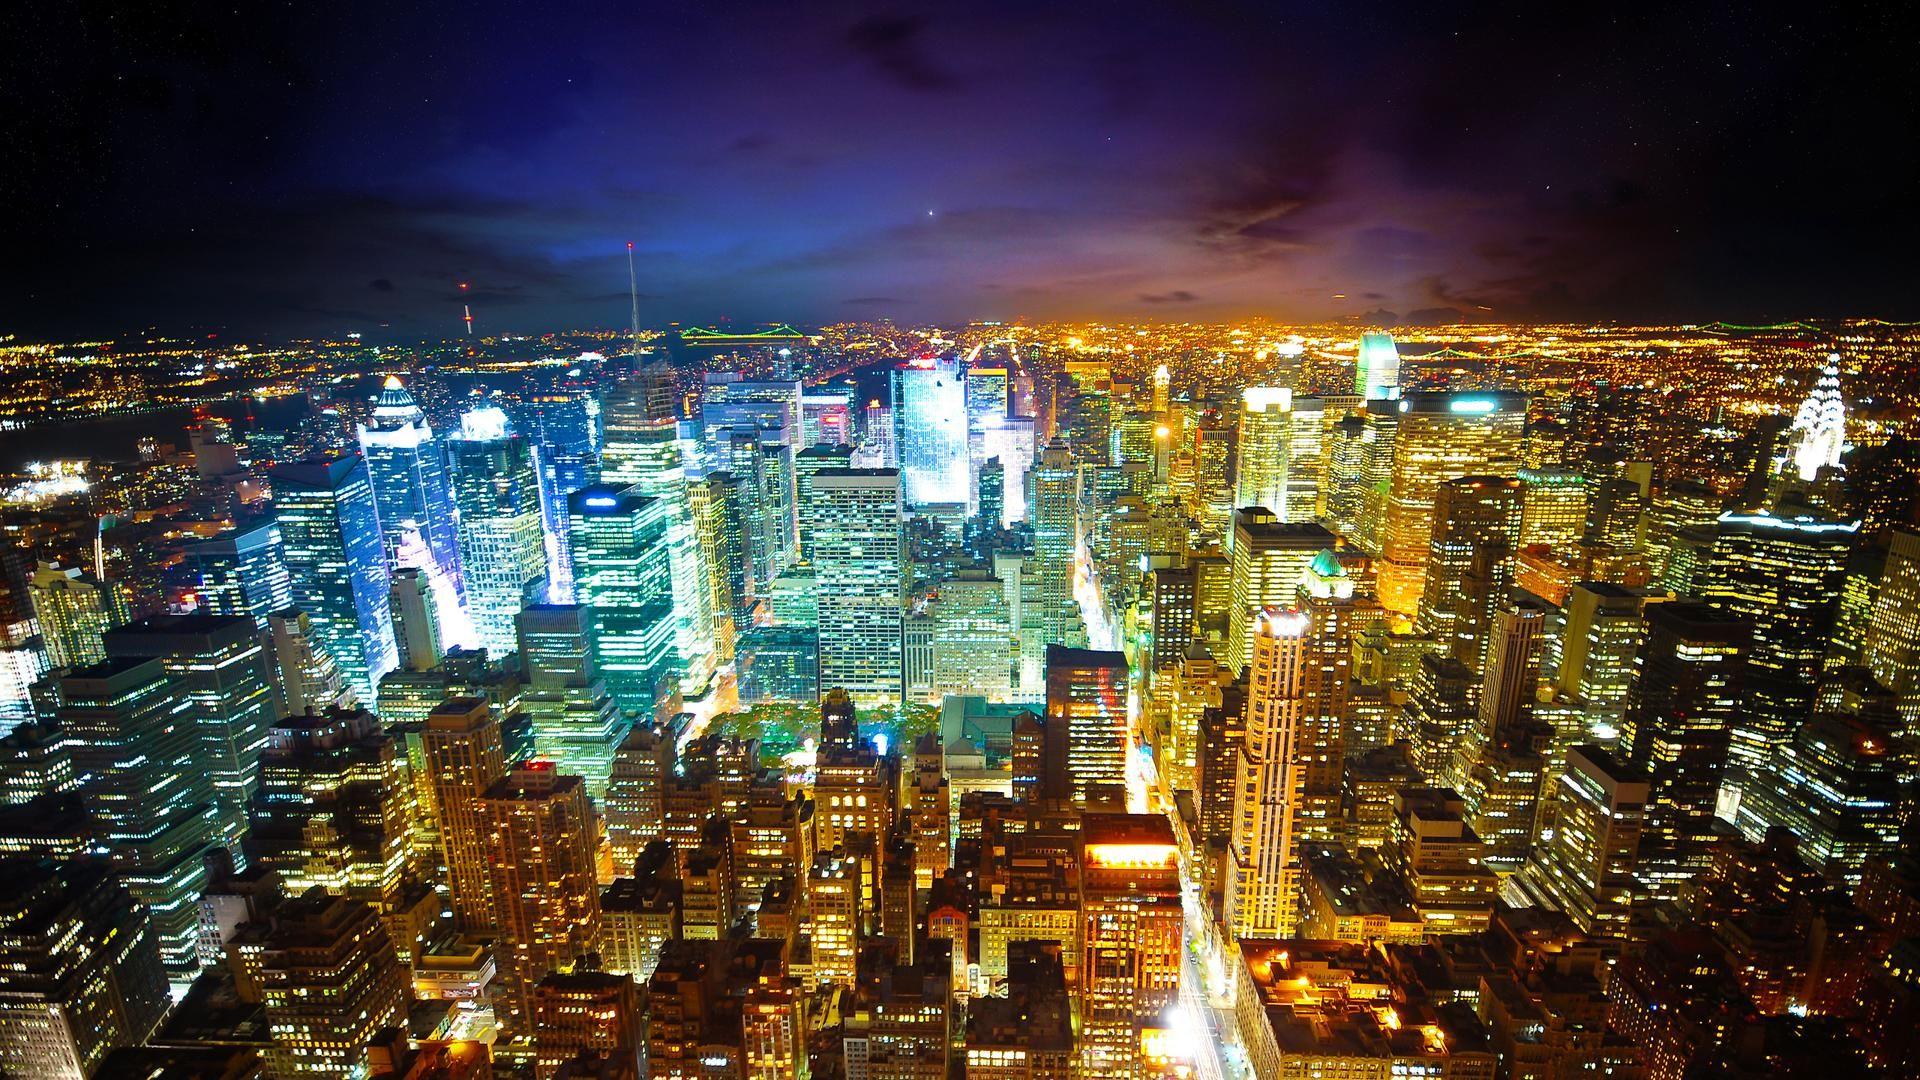 City night skyline hd